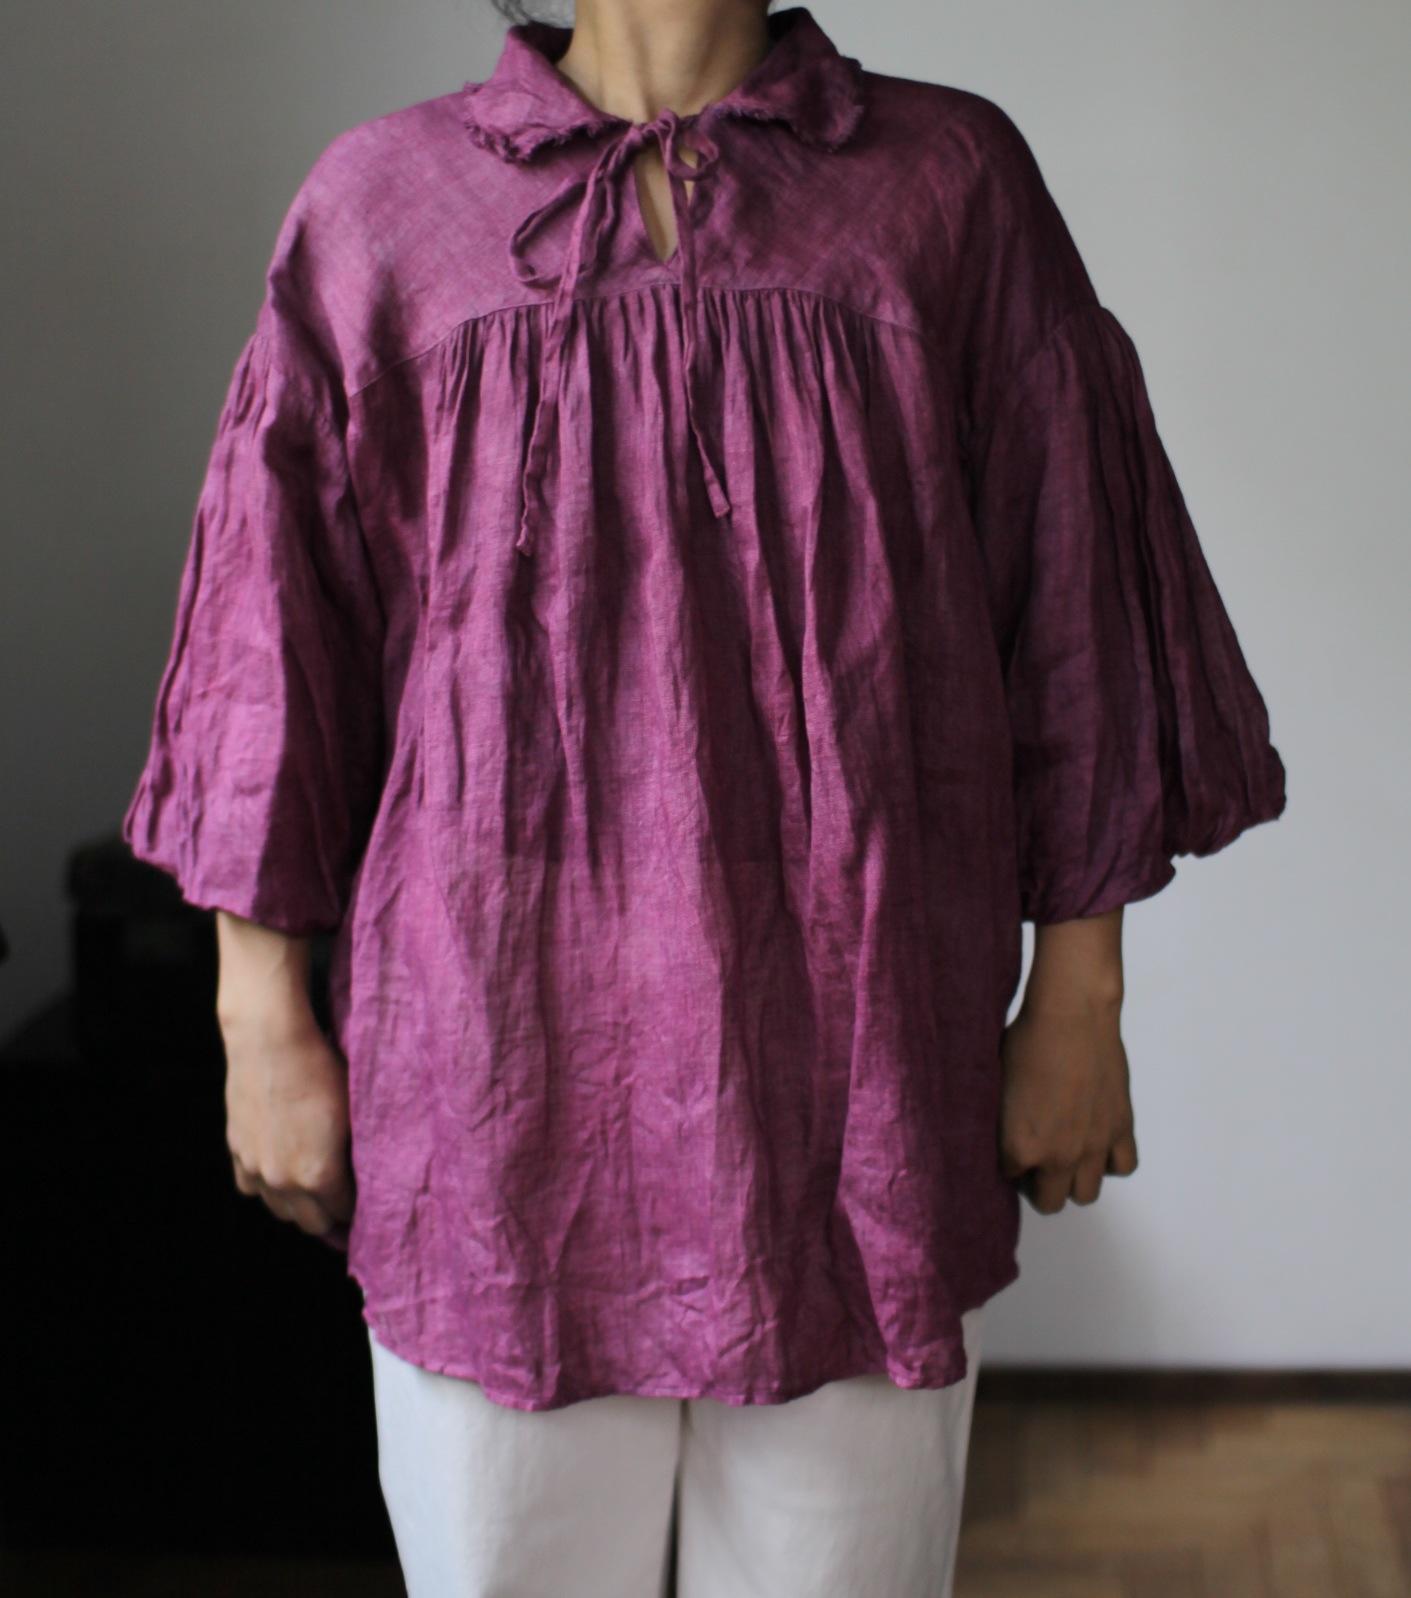 2015 Spring/Summer リネンシングルガーゼのブラウス Linen gauze blouse(B-1531)ラズベリー